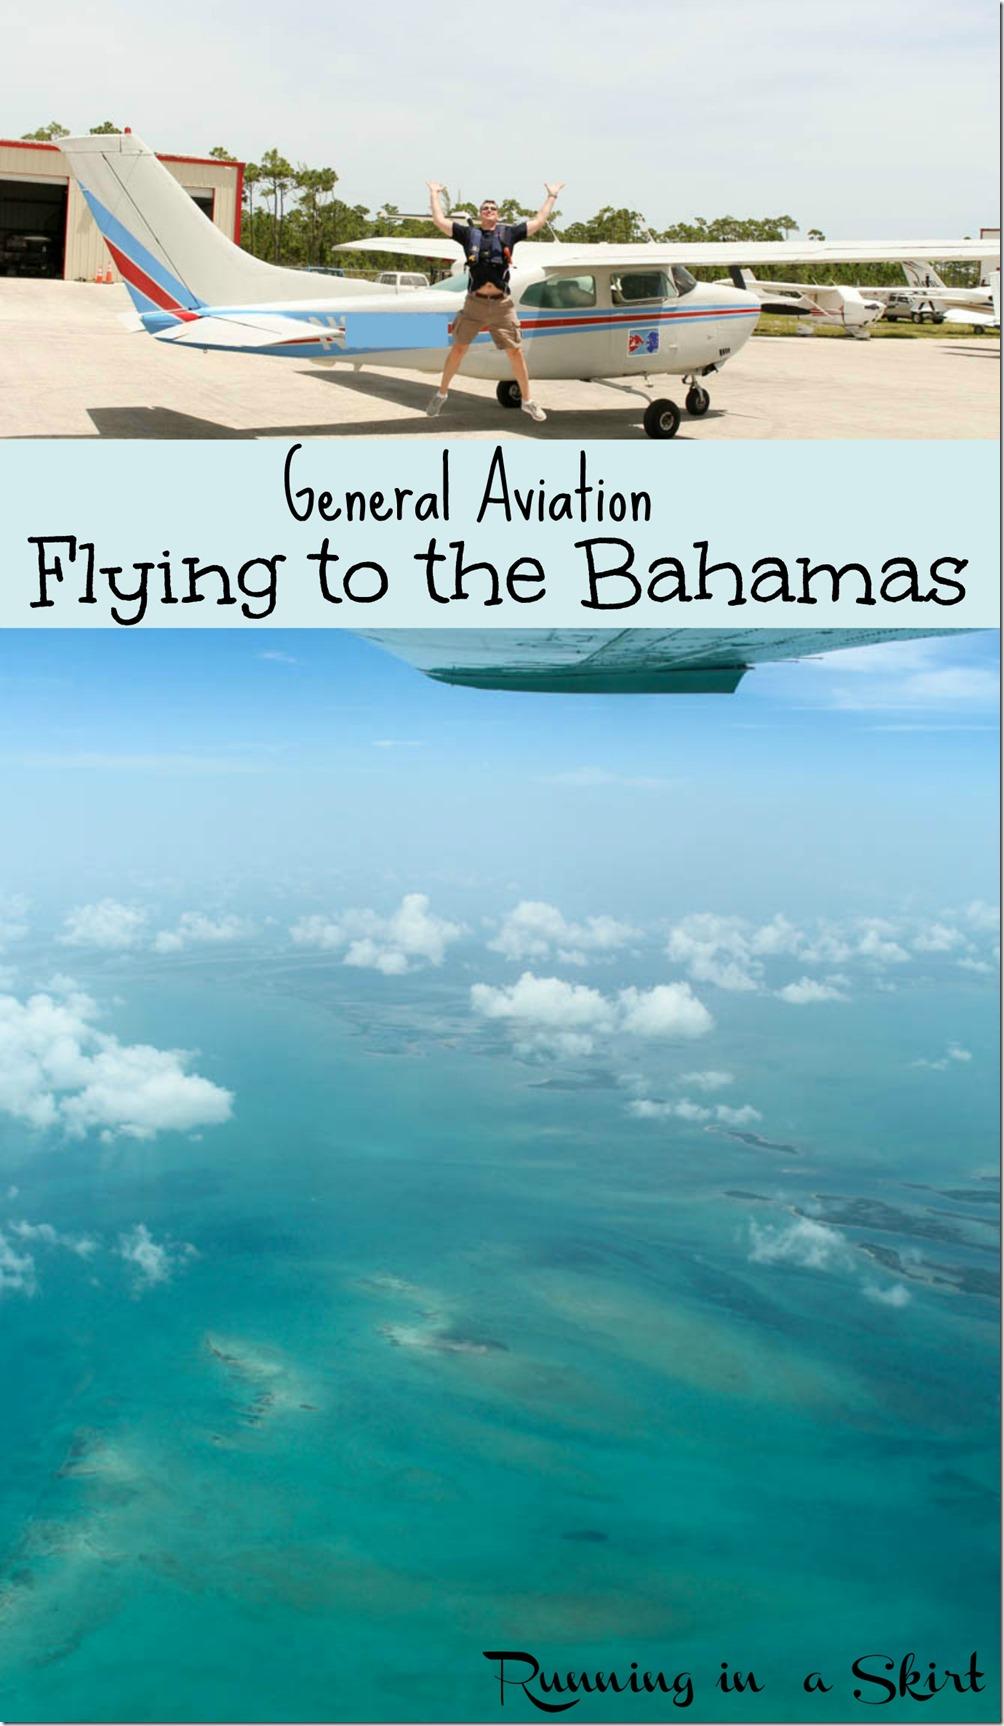 General Aviation Flying to the Bahamas, Marsh Harbor Airport